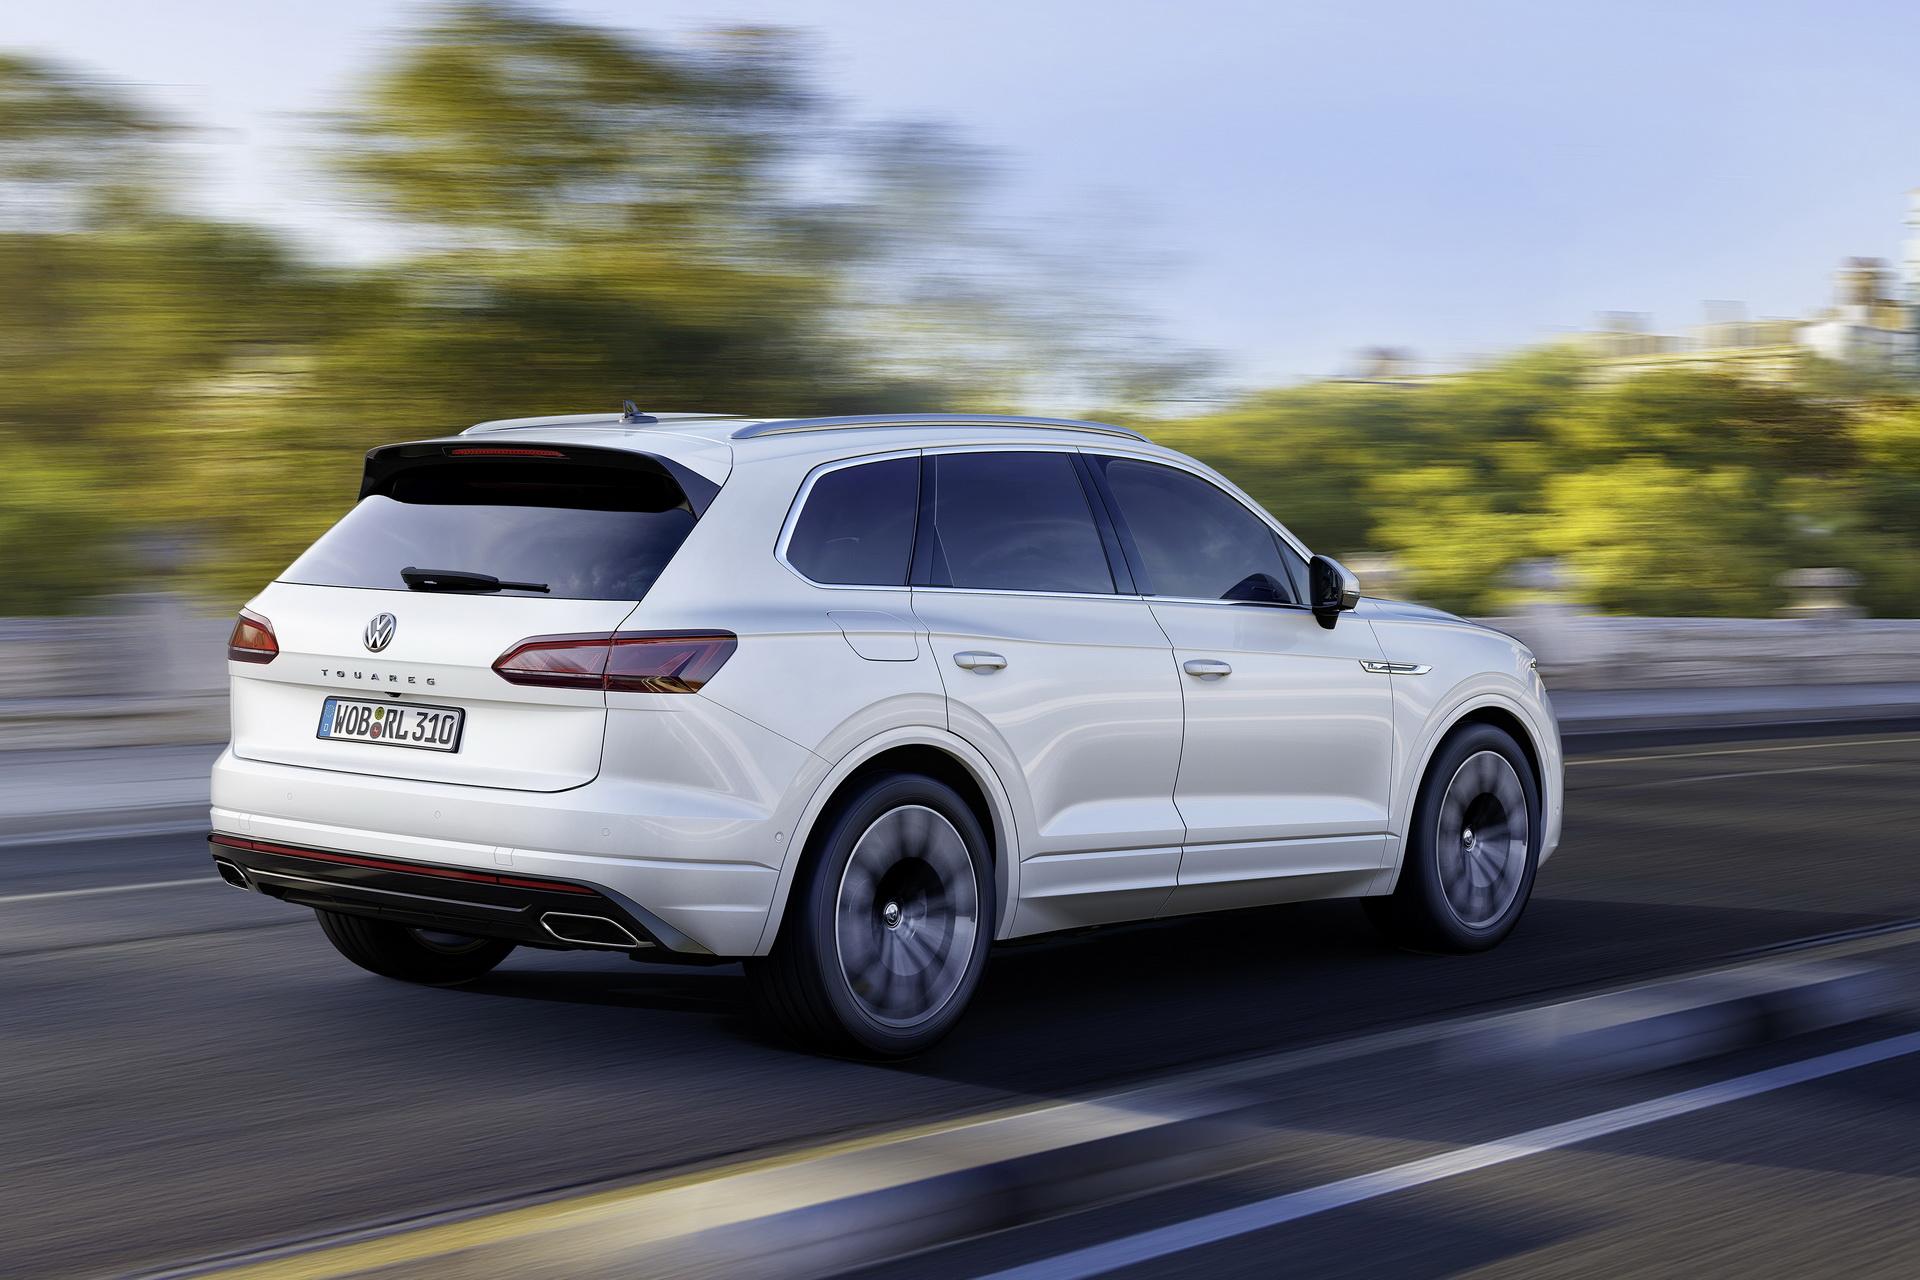 Volkswagen Touareg 2018 (26)